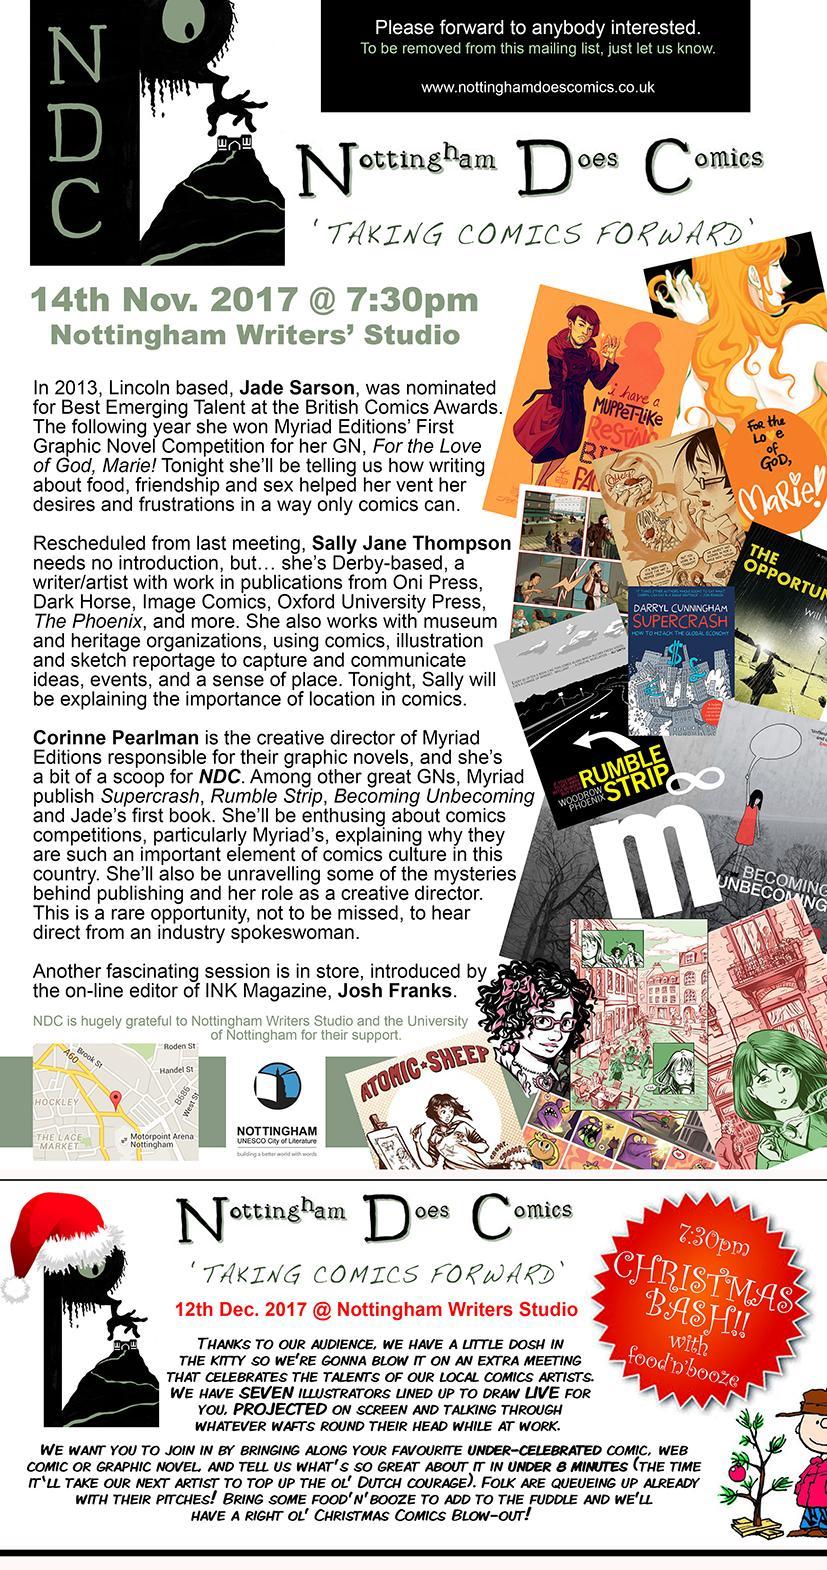 Nottingham Does Comics - November 2017